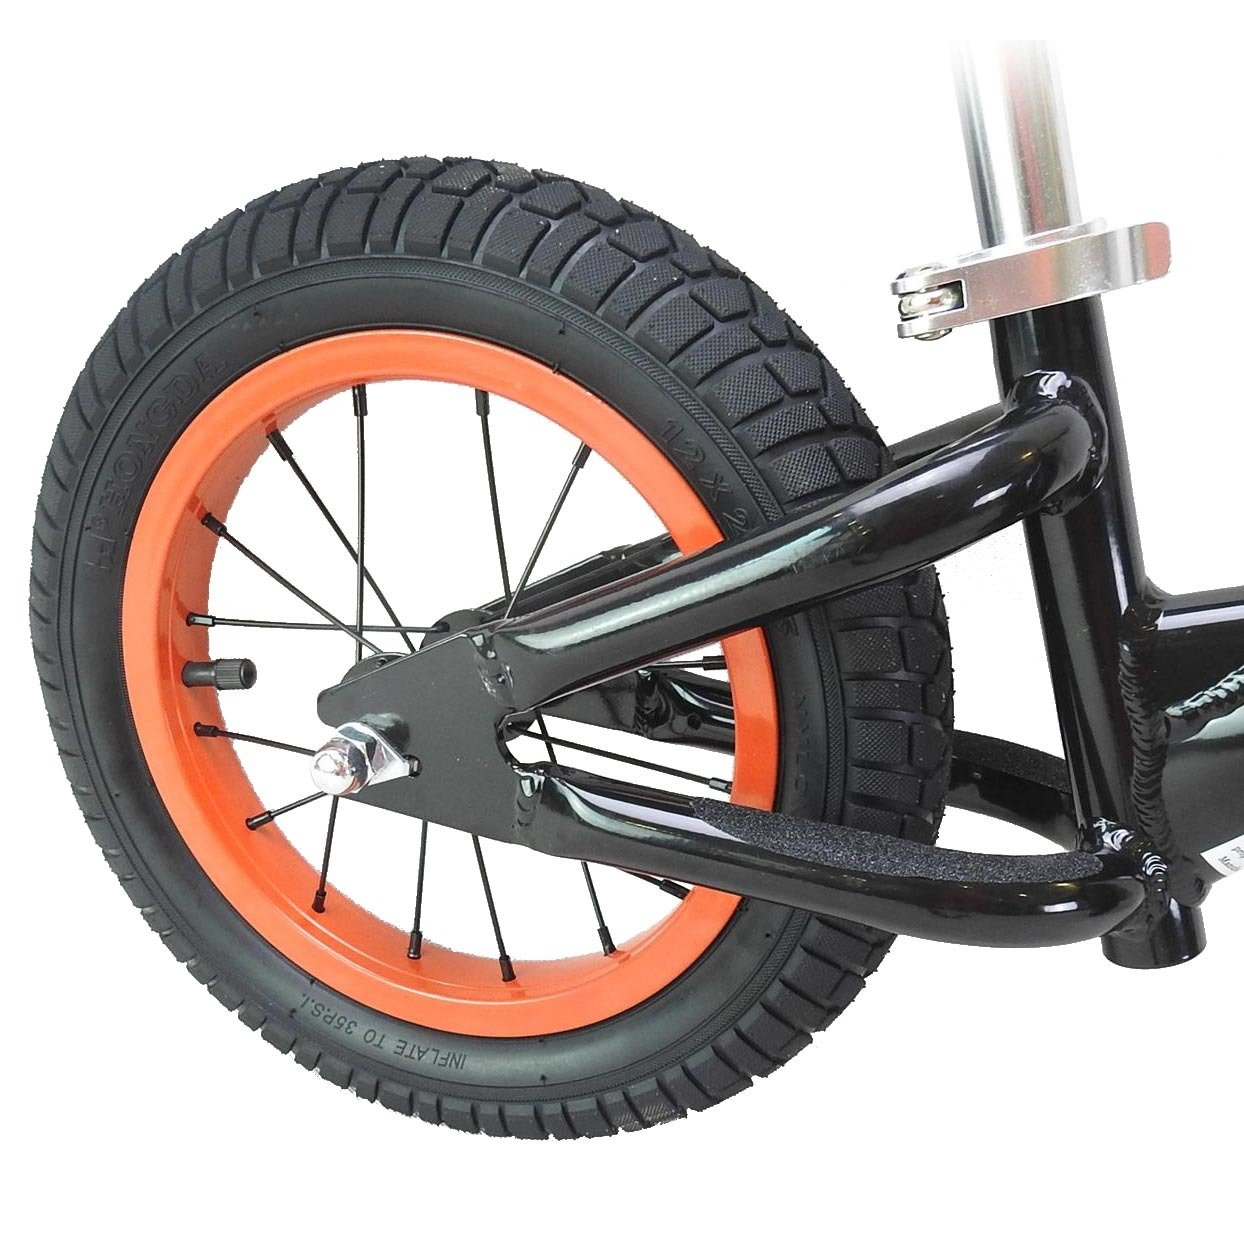 CyclingDeal Alloy Kids Push Balance No-Pedal Bike 12'' Black by CyclingDeal (Image #4)